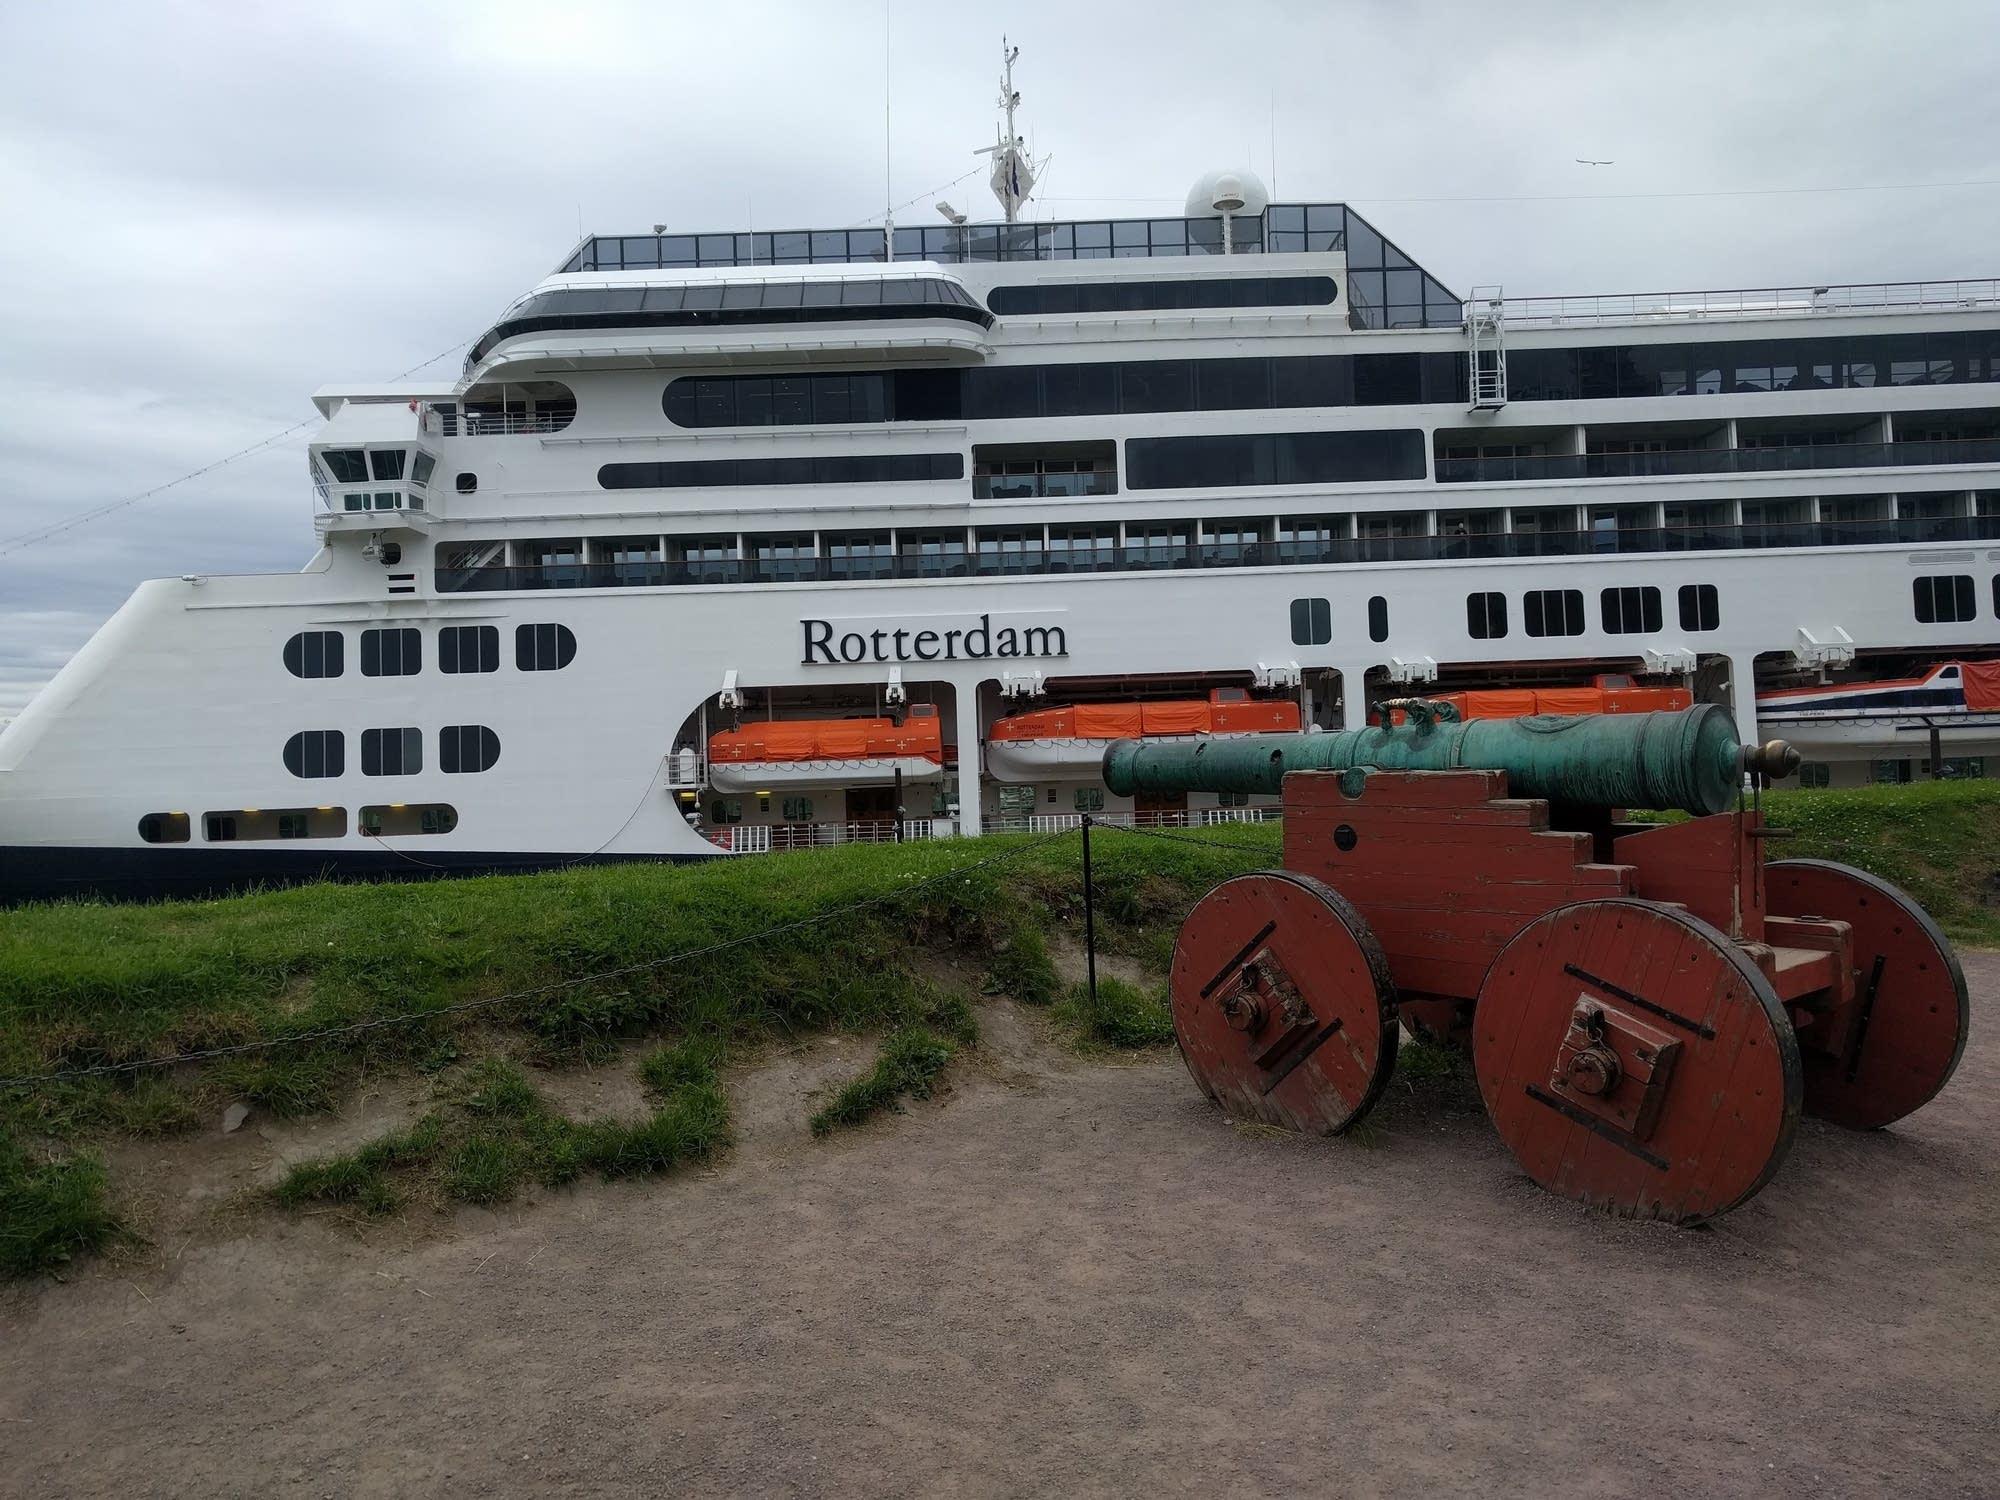 Oslo - 02 - Rotterdam and cannon